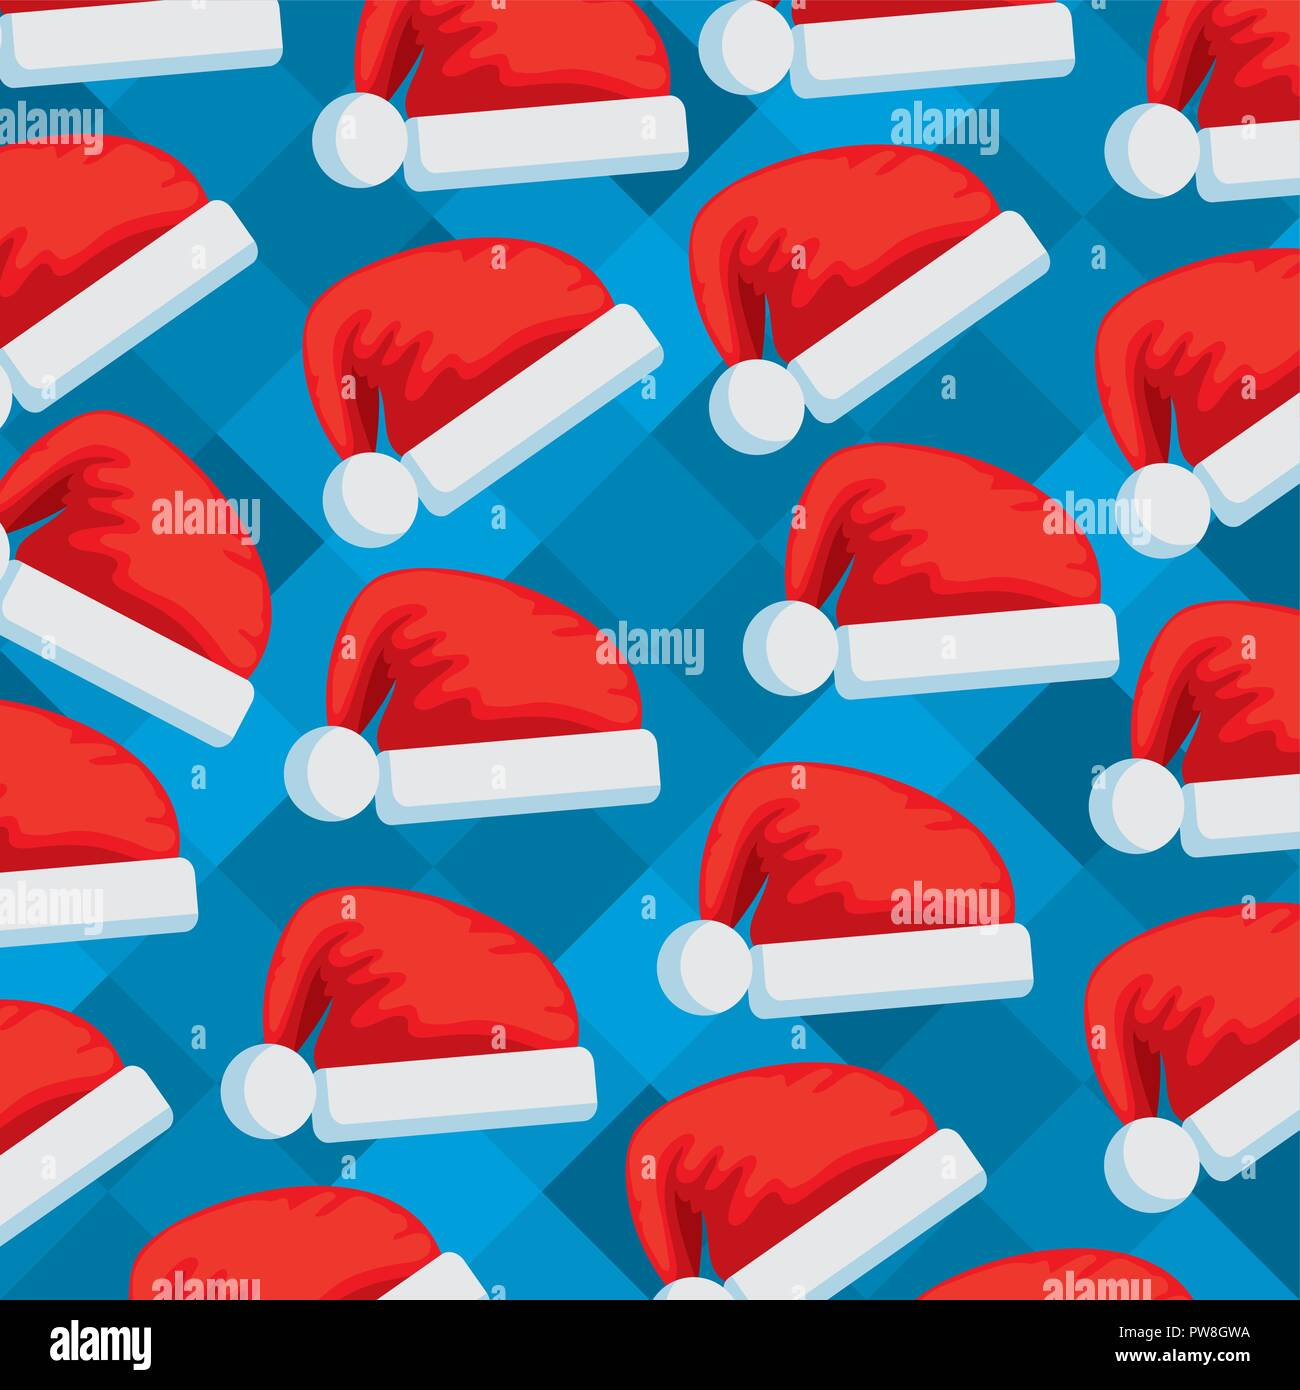 santa claus hats pattern - Stock Image